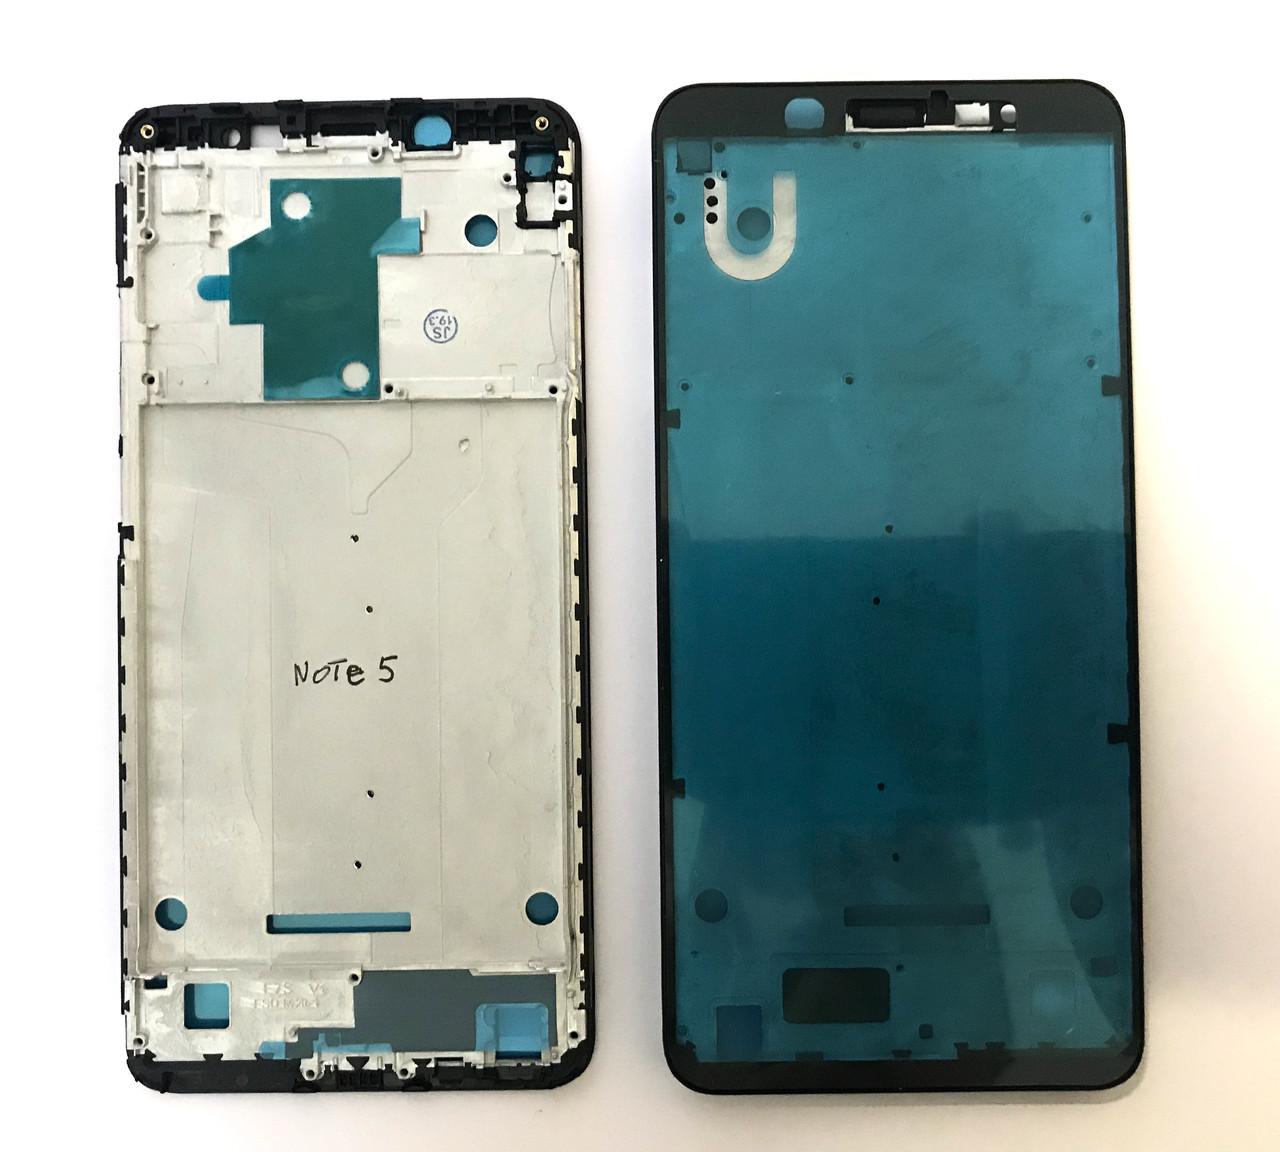 Xioami Redmi Note 5 Frame Рамка Дисплею (Внутрішня частина корпуса)